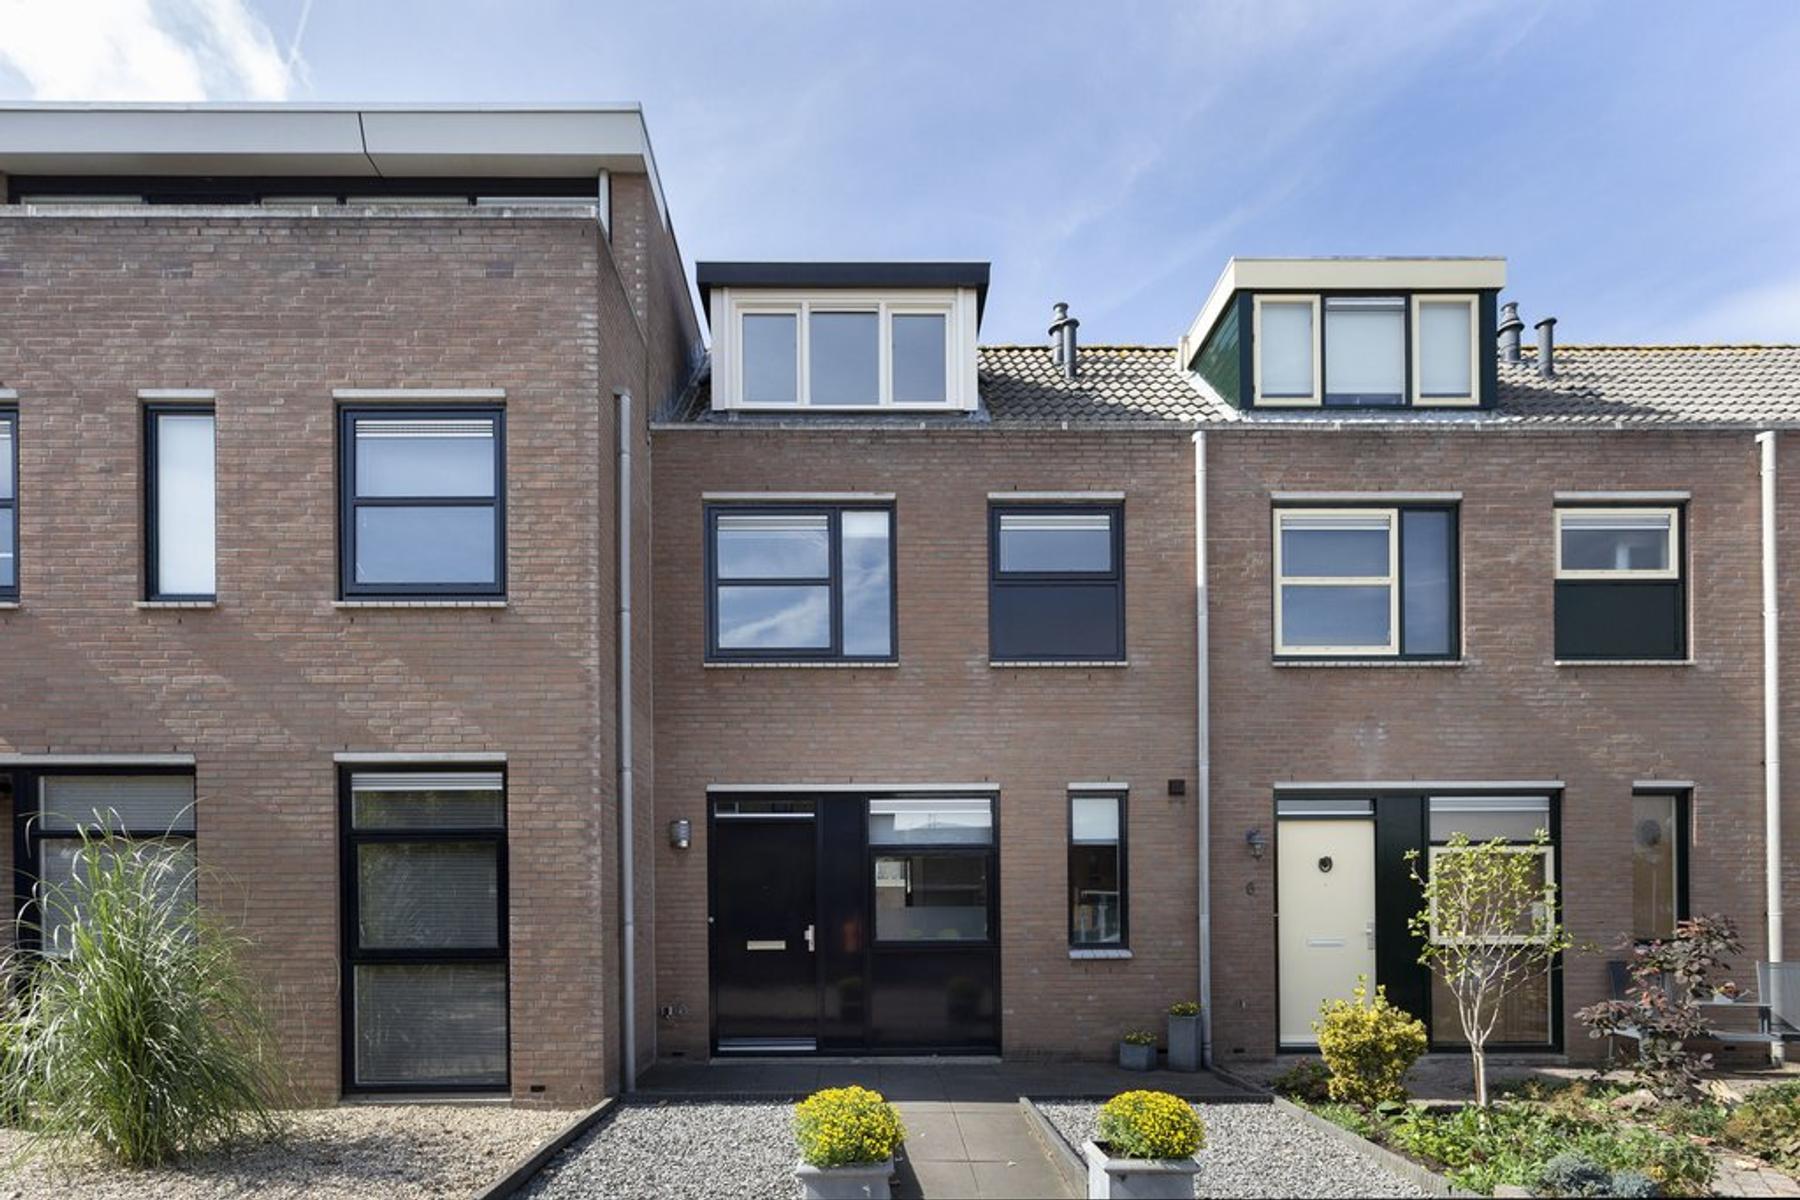 Waterland 8 in Stolwijk 2821 ZH